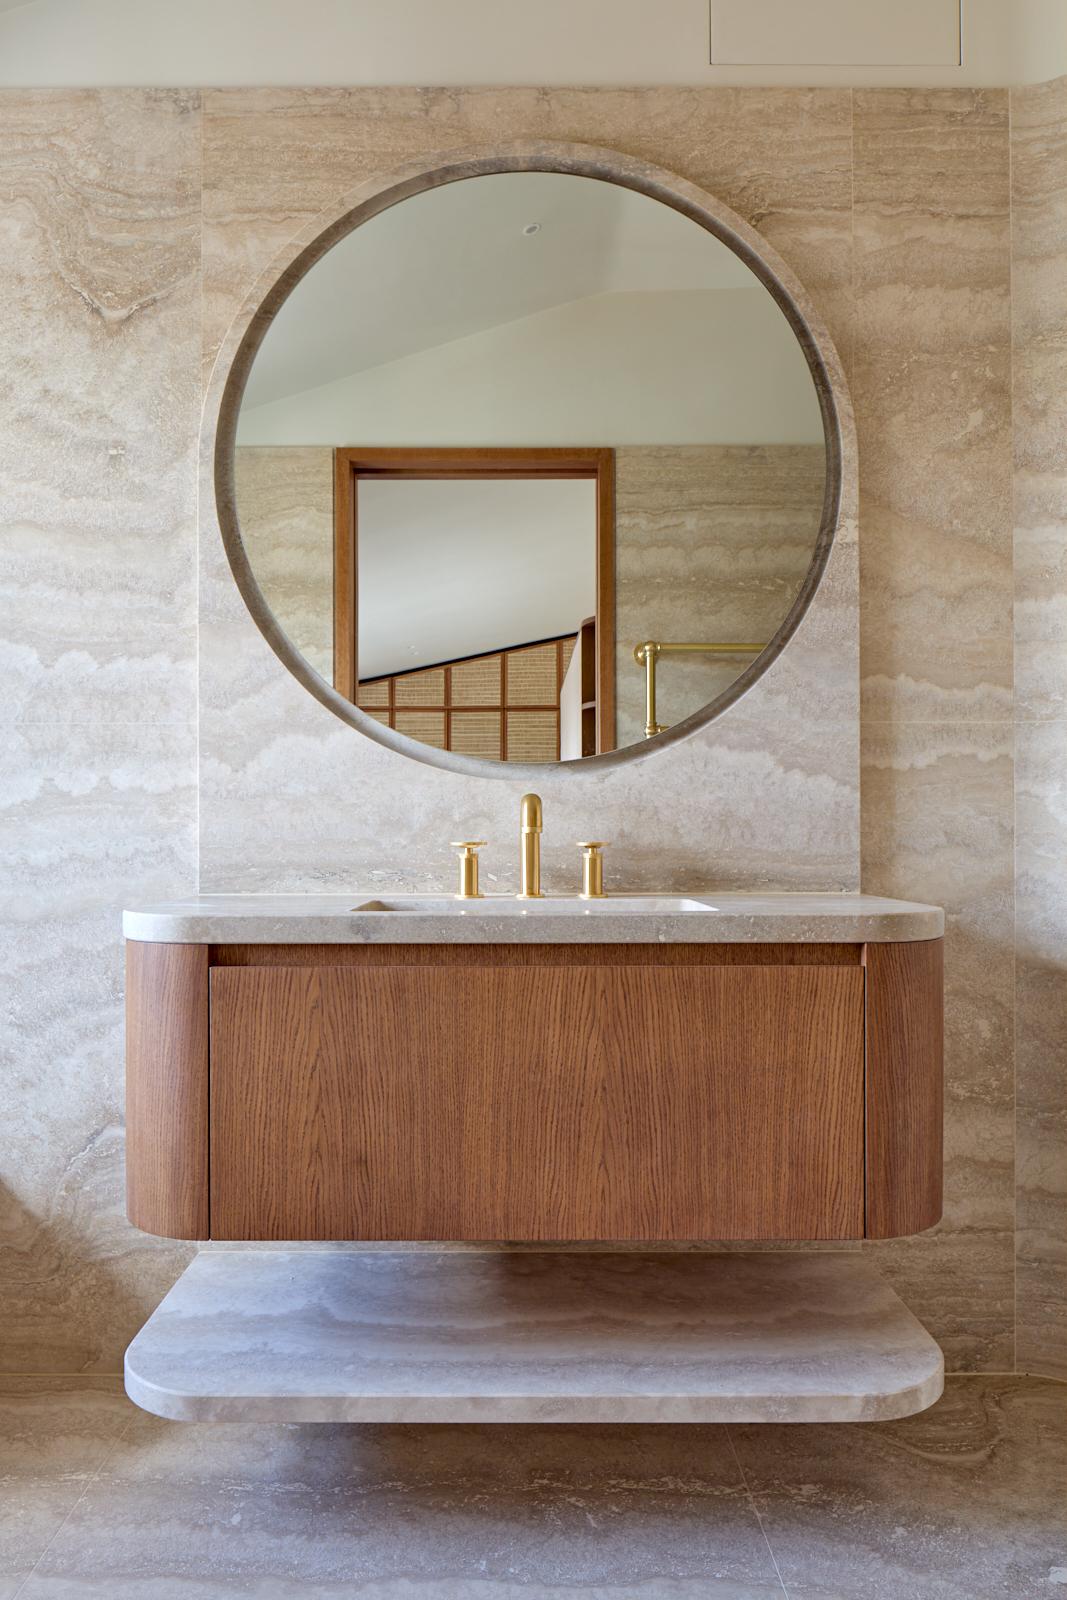 Gabriel Chipperfield, interior, bathroom